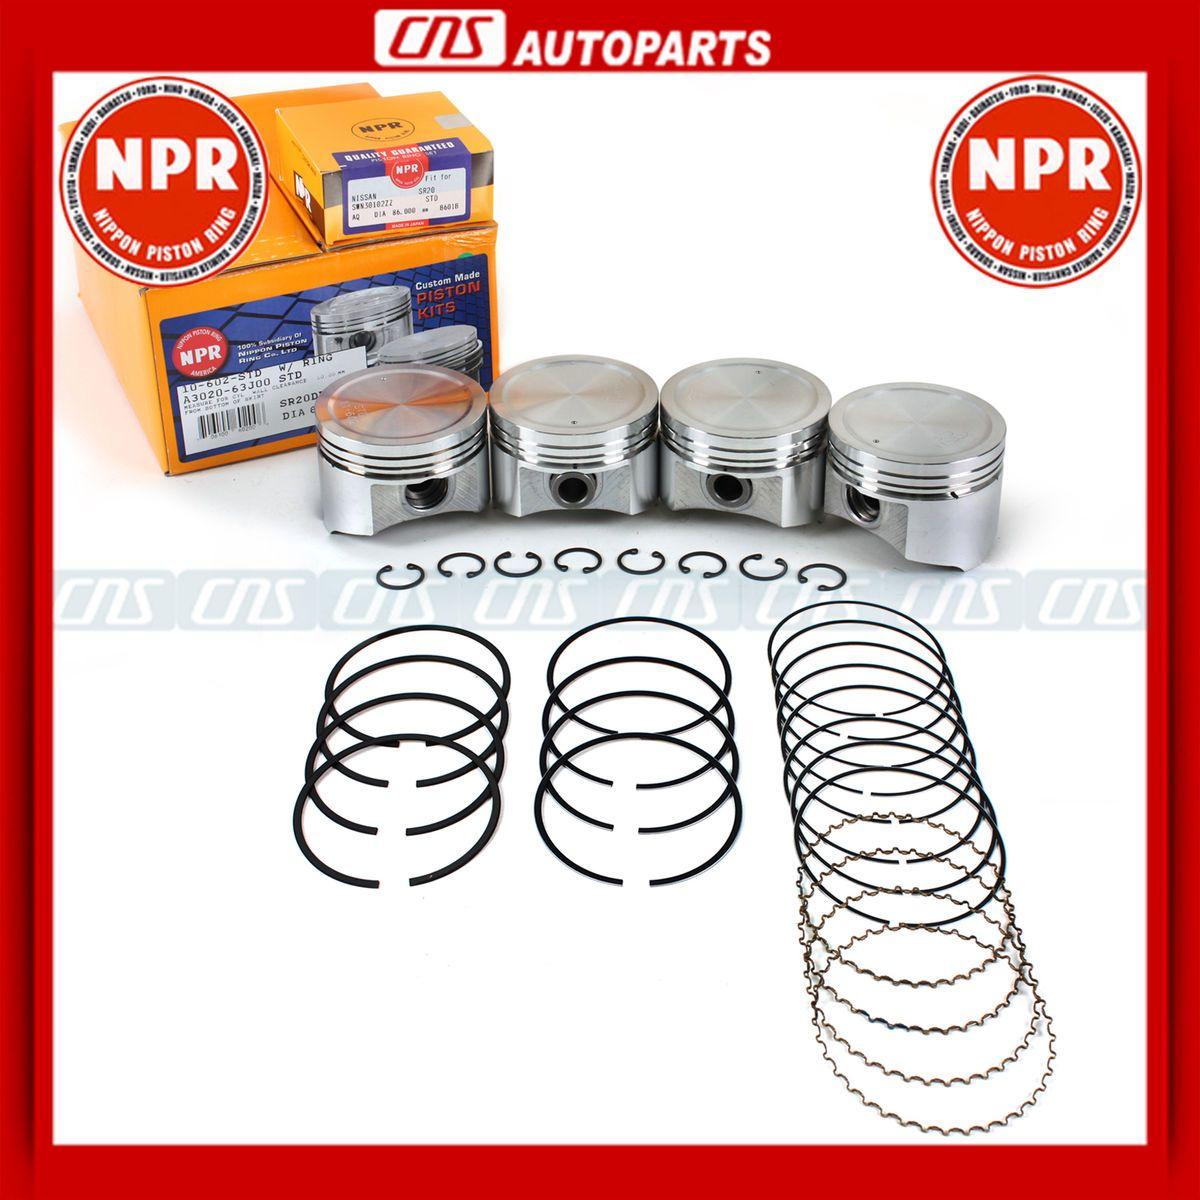 99 Infiniti G20 Engine Car Fuse Box Panel Source Npr Piston Rings Set 91 Nissan Sentra 2 0l Dohc